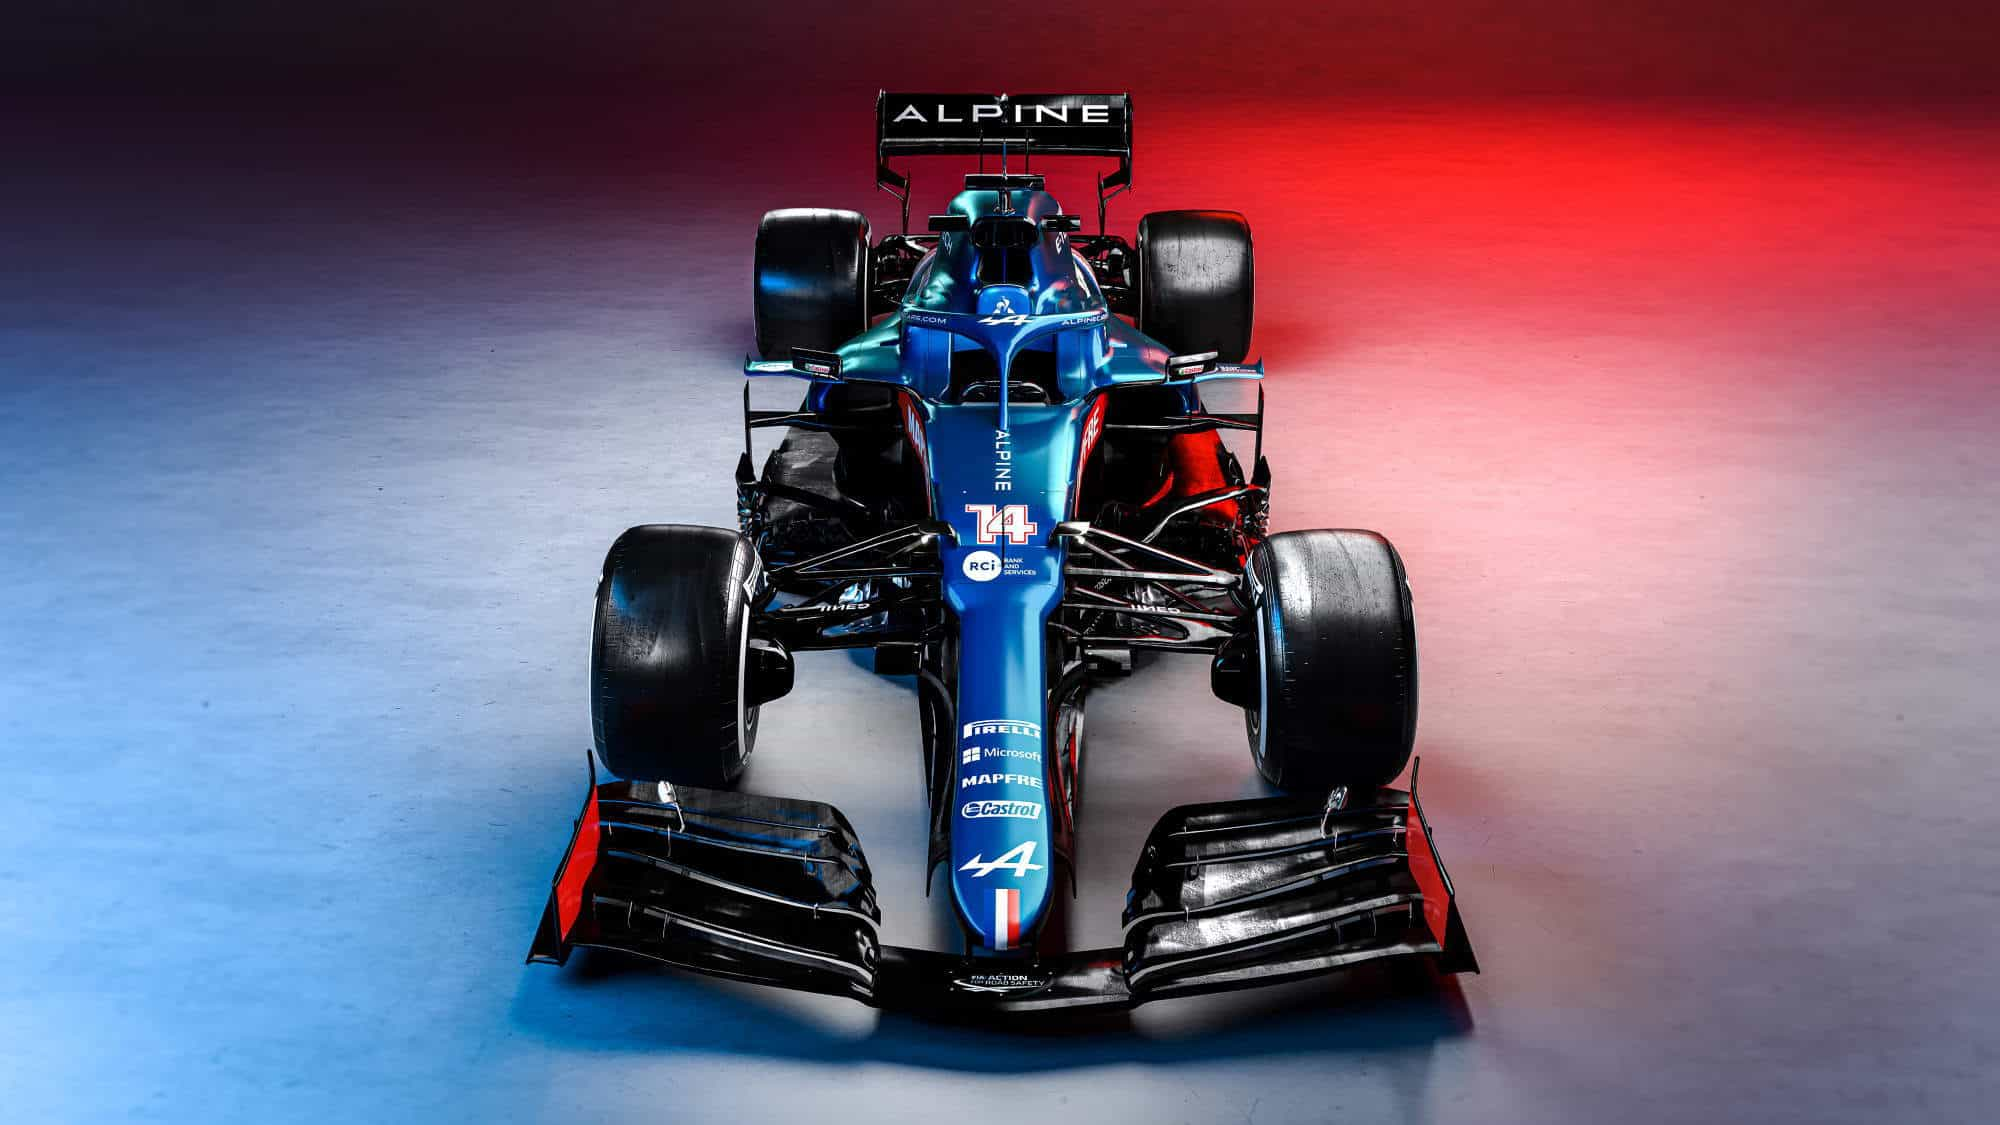 2021 Alpine F1 2021 car AT521 front Photo Alpine